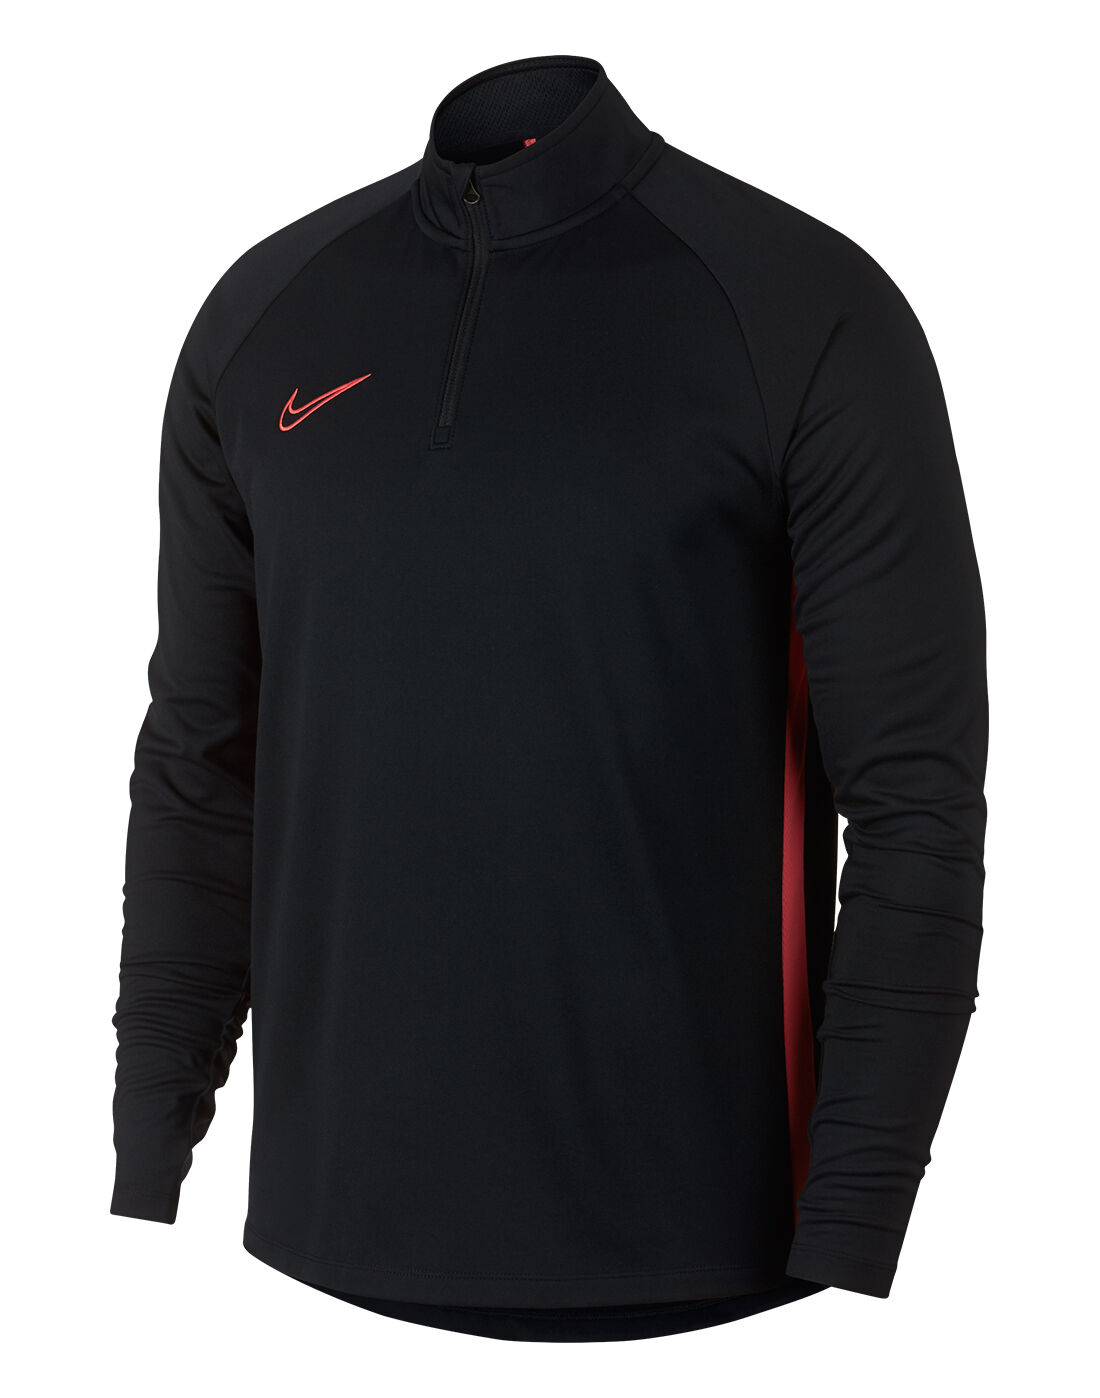 Nike Academy Training 1/4 Zip Top